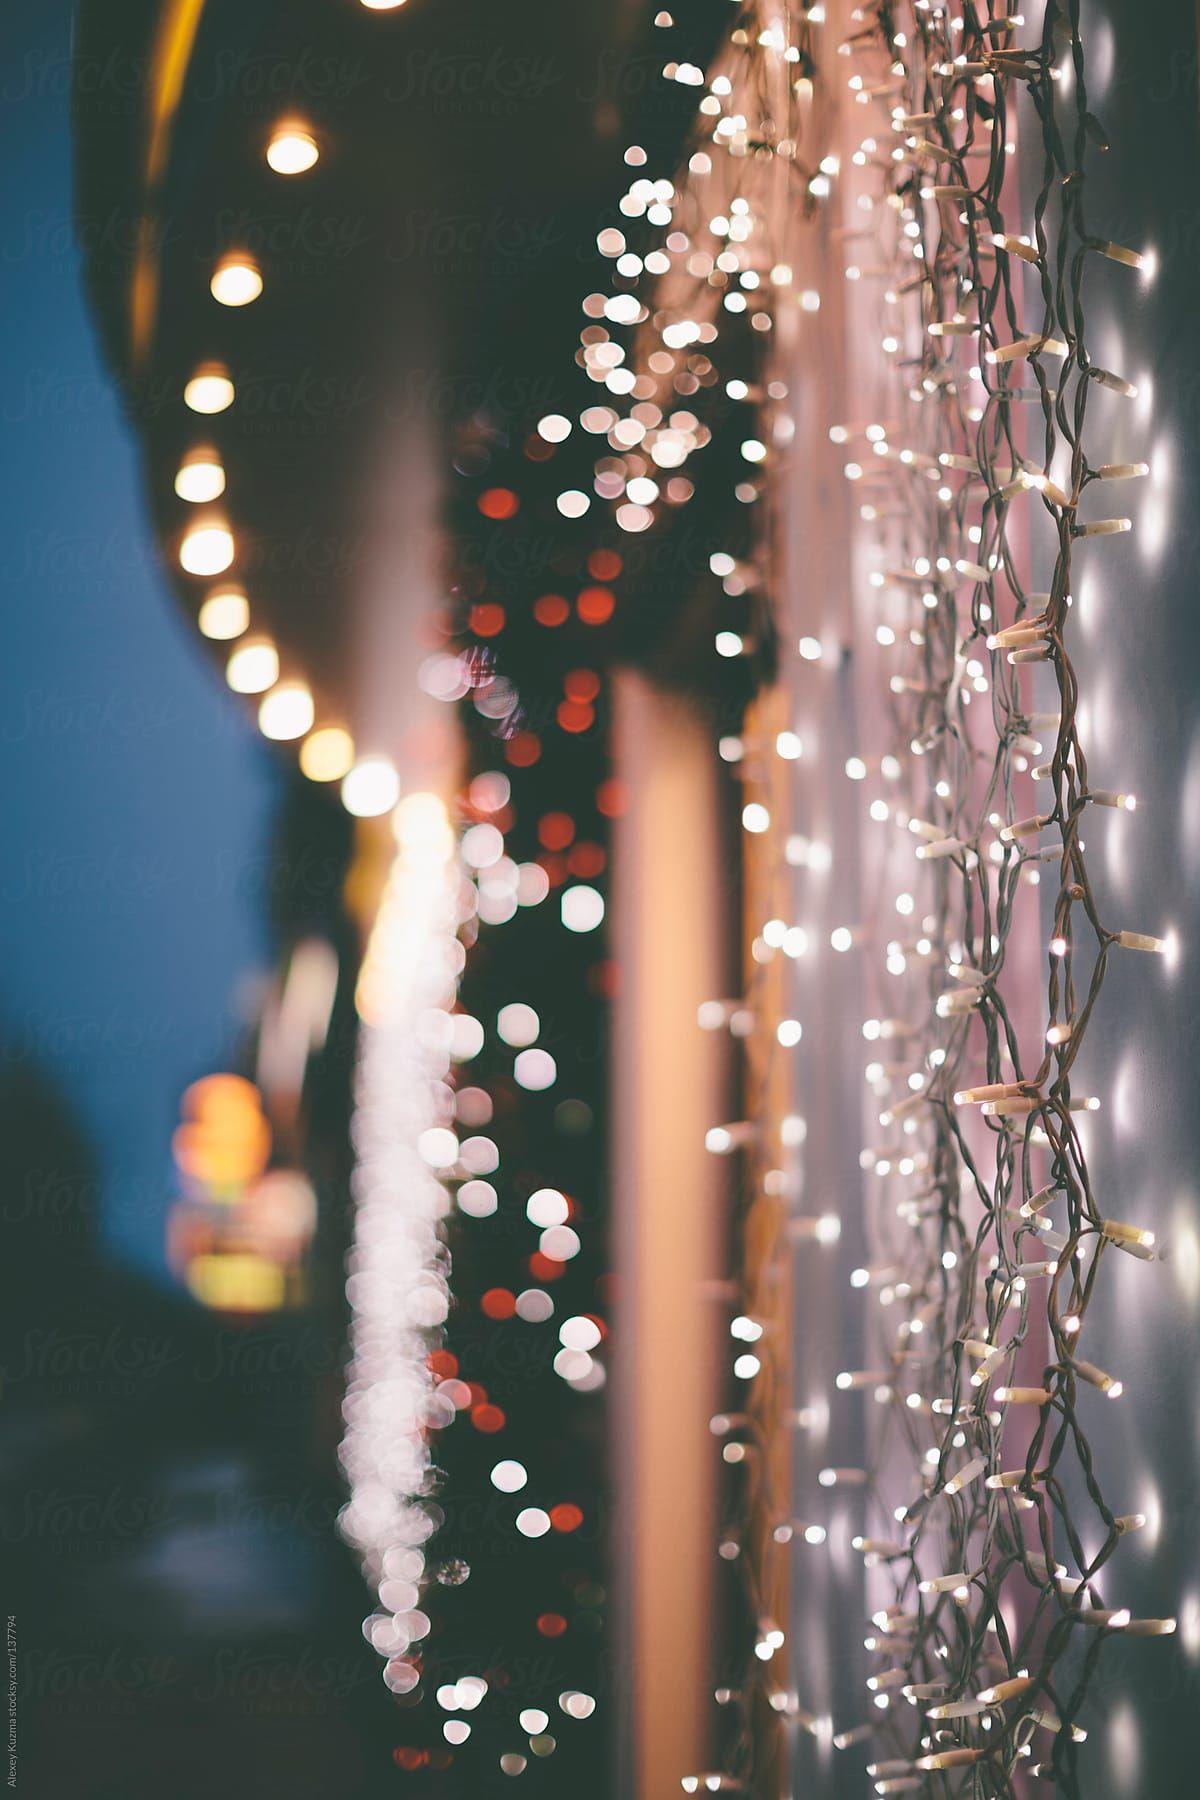 Christmas Lights Download this highresolution stock photo